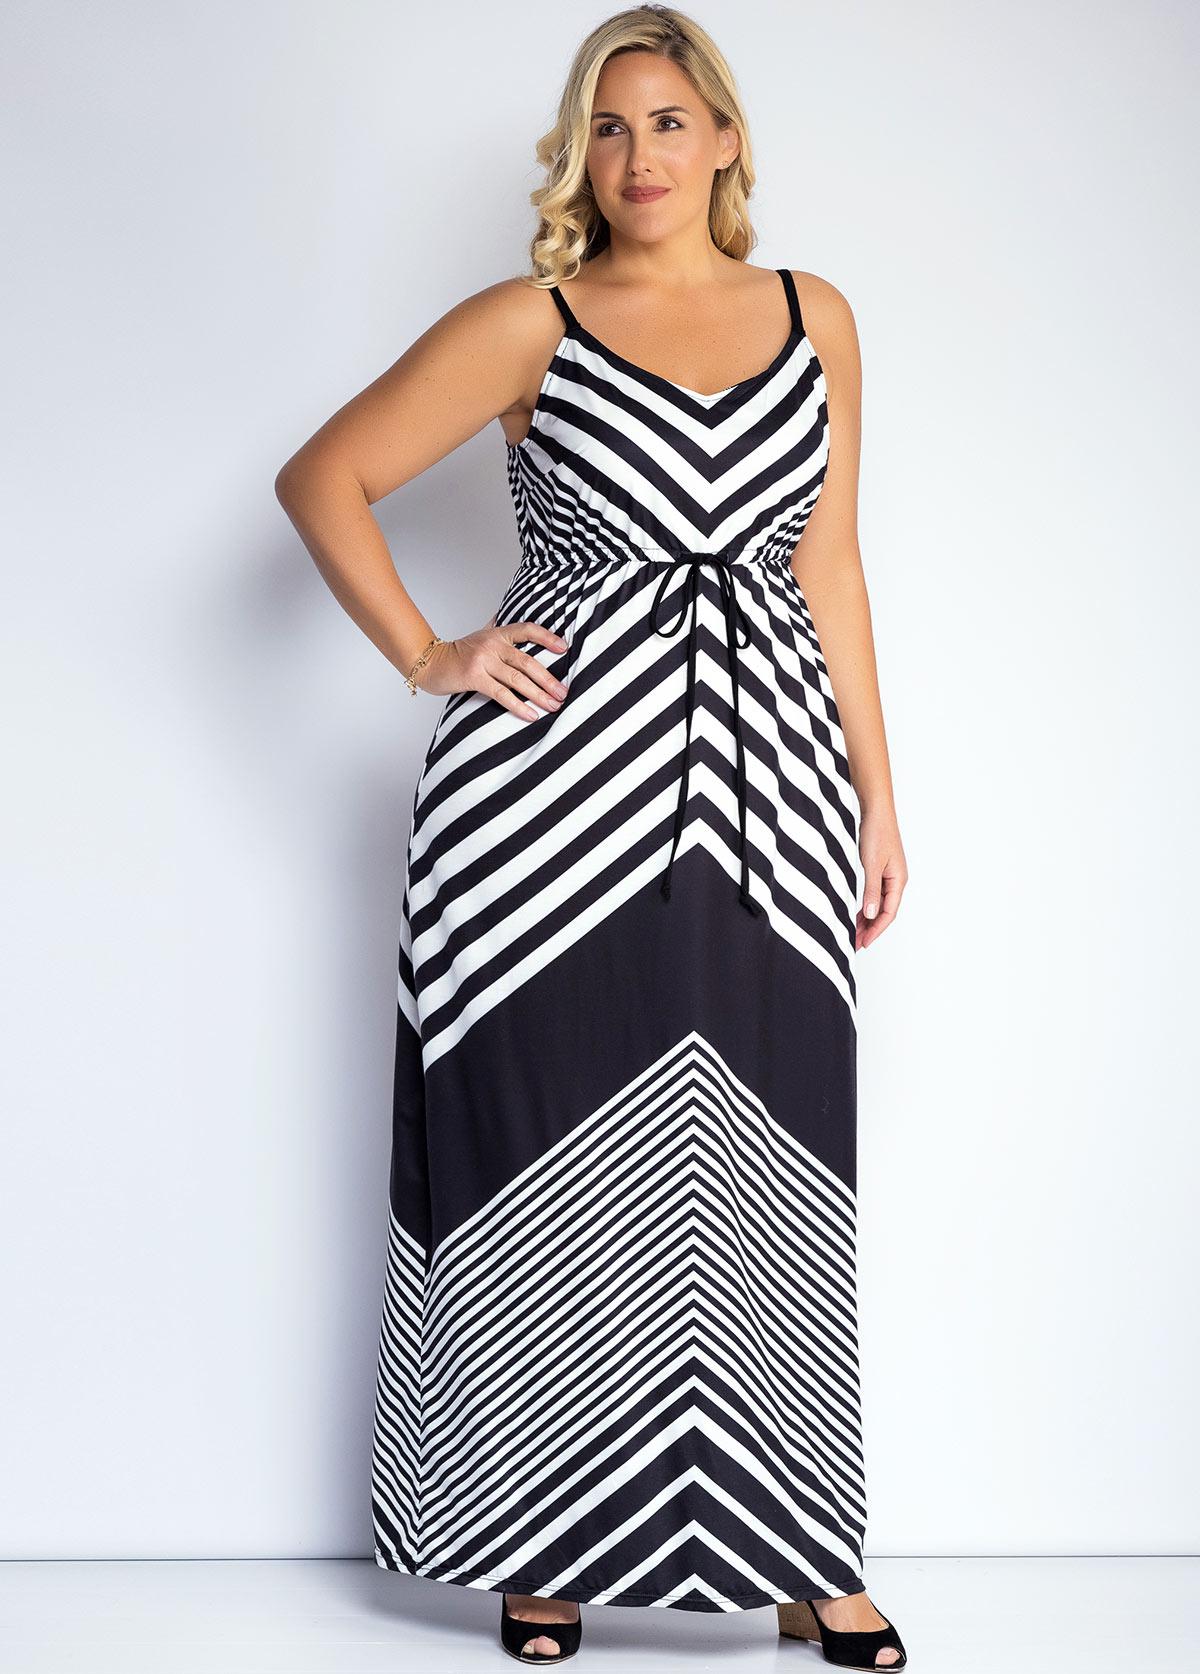 ROTITA Striped Plus Size Spaghetti Strap Dress